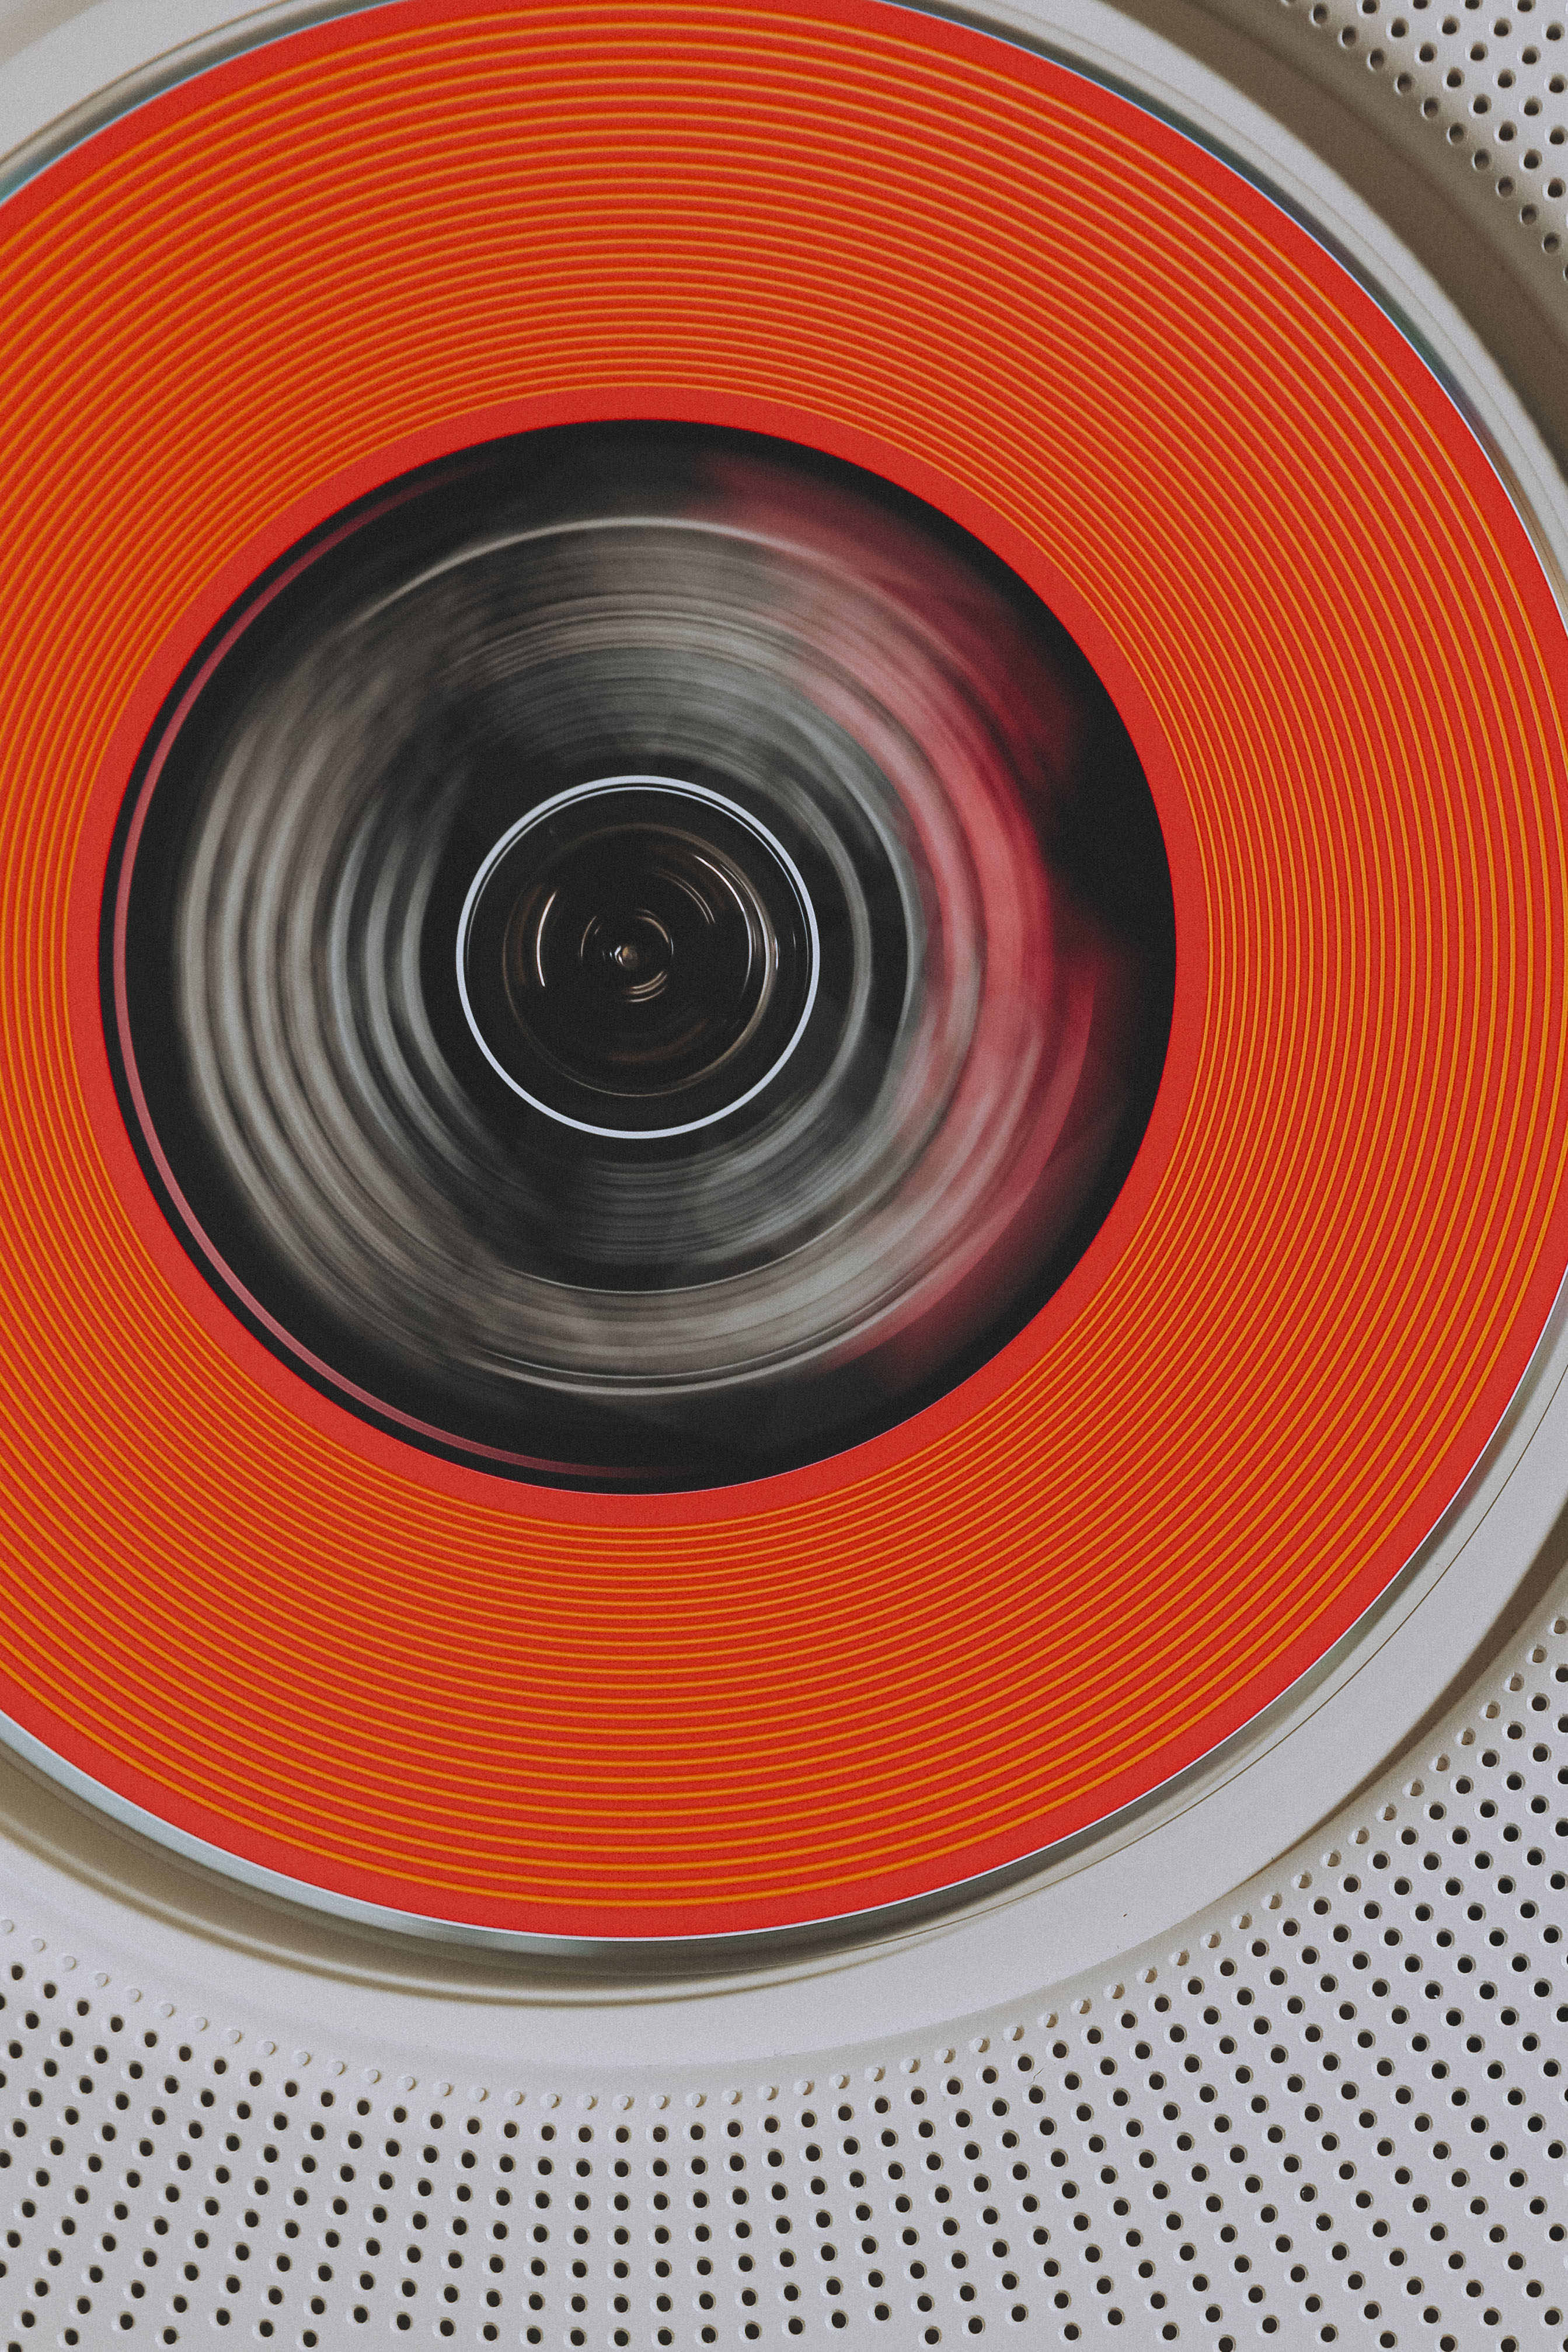 Fukasawa: Making Music for MUJI, Preserving CDs for Life